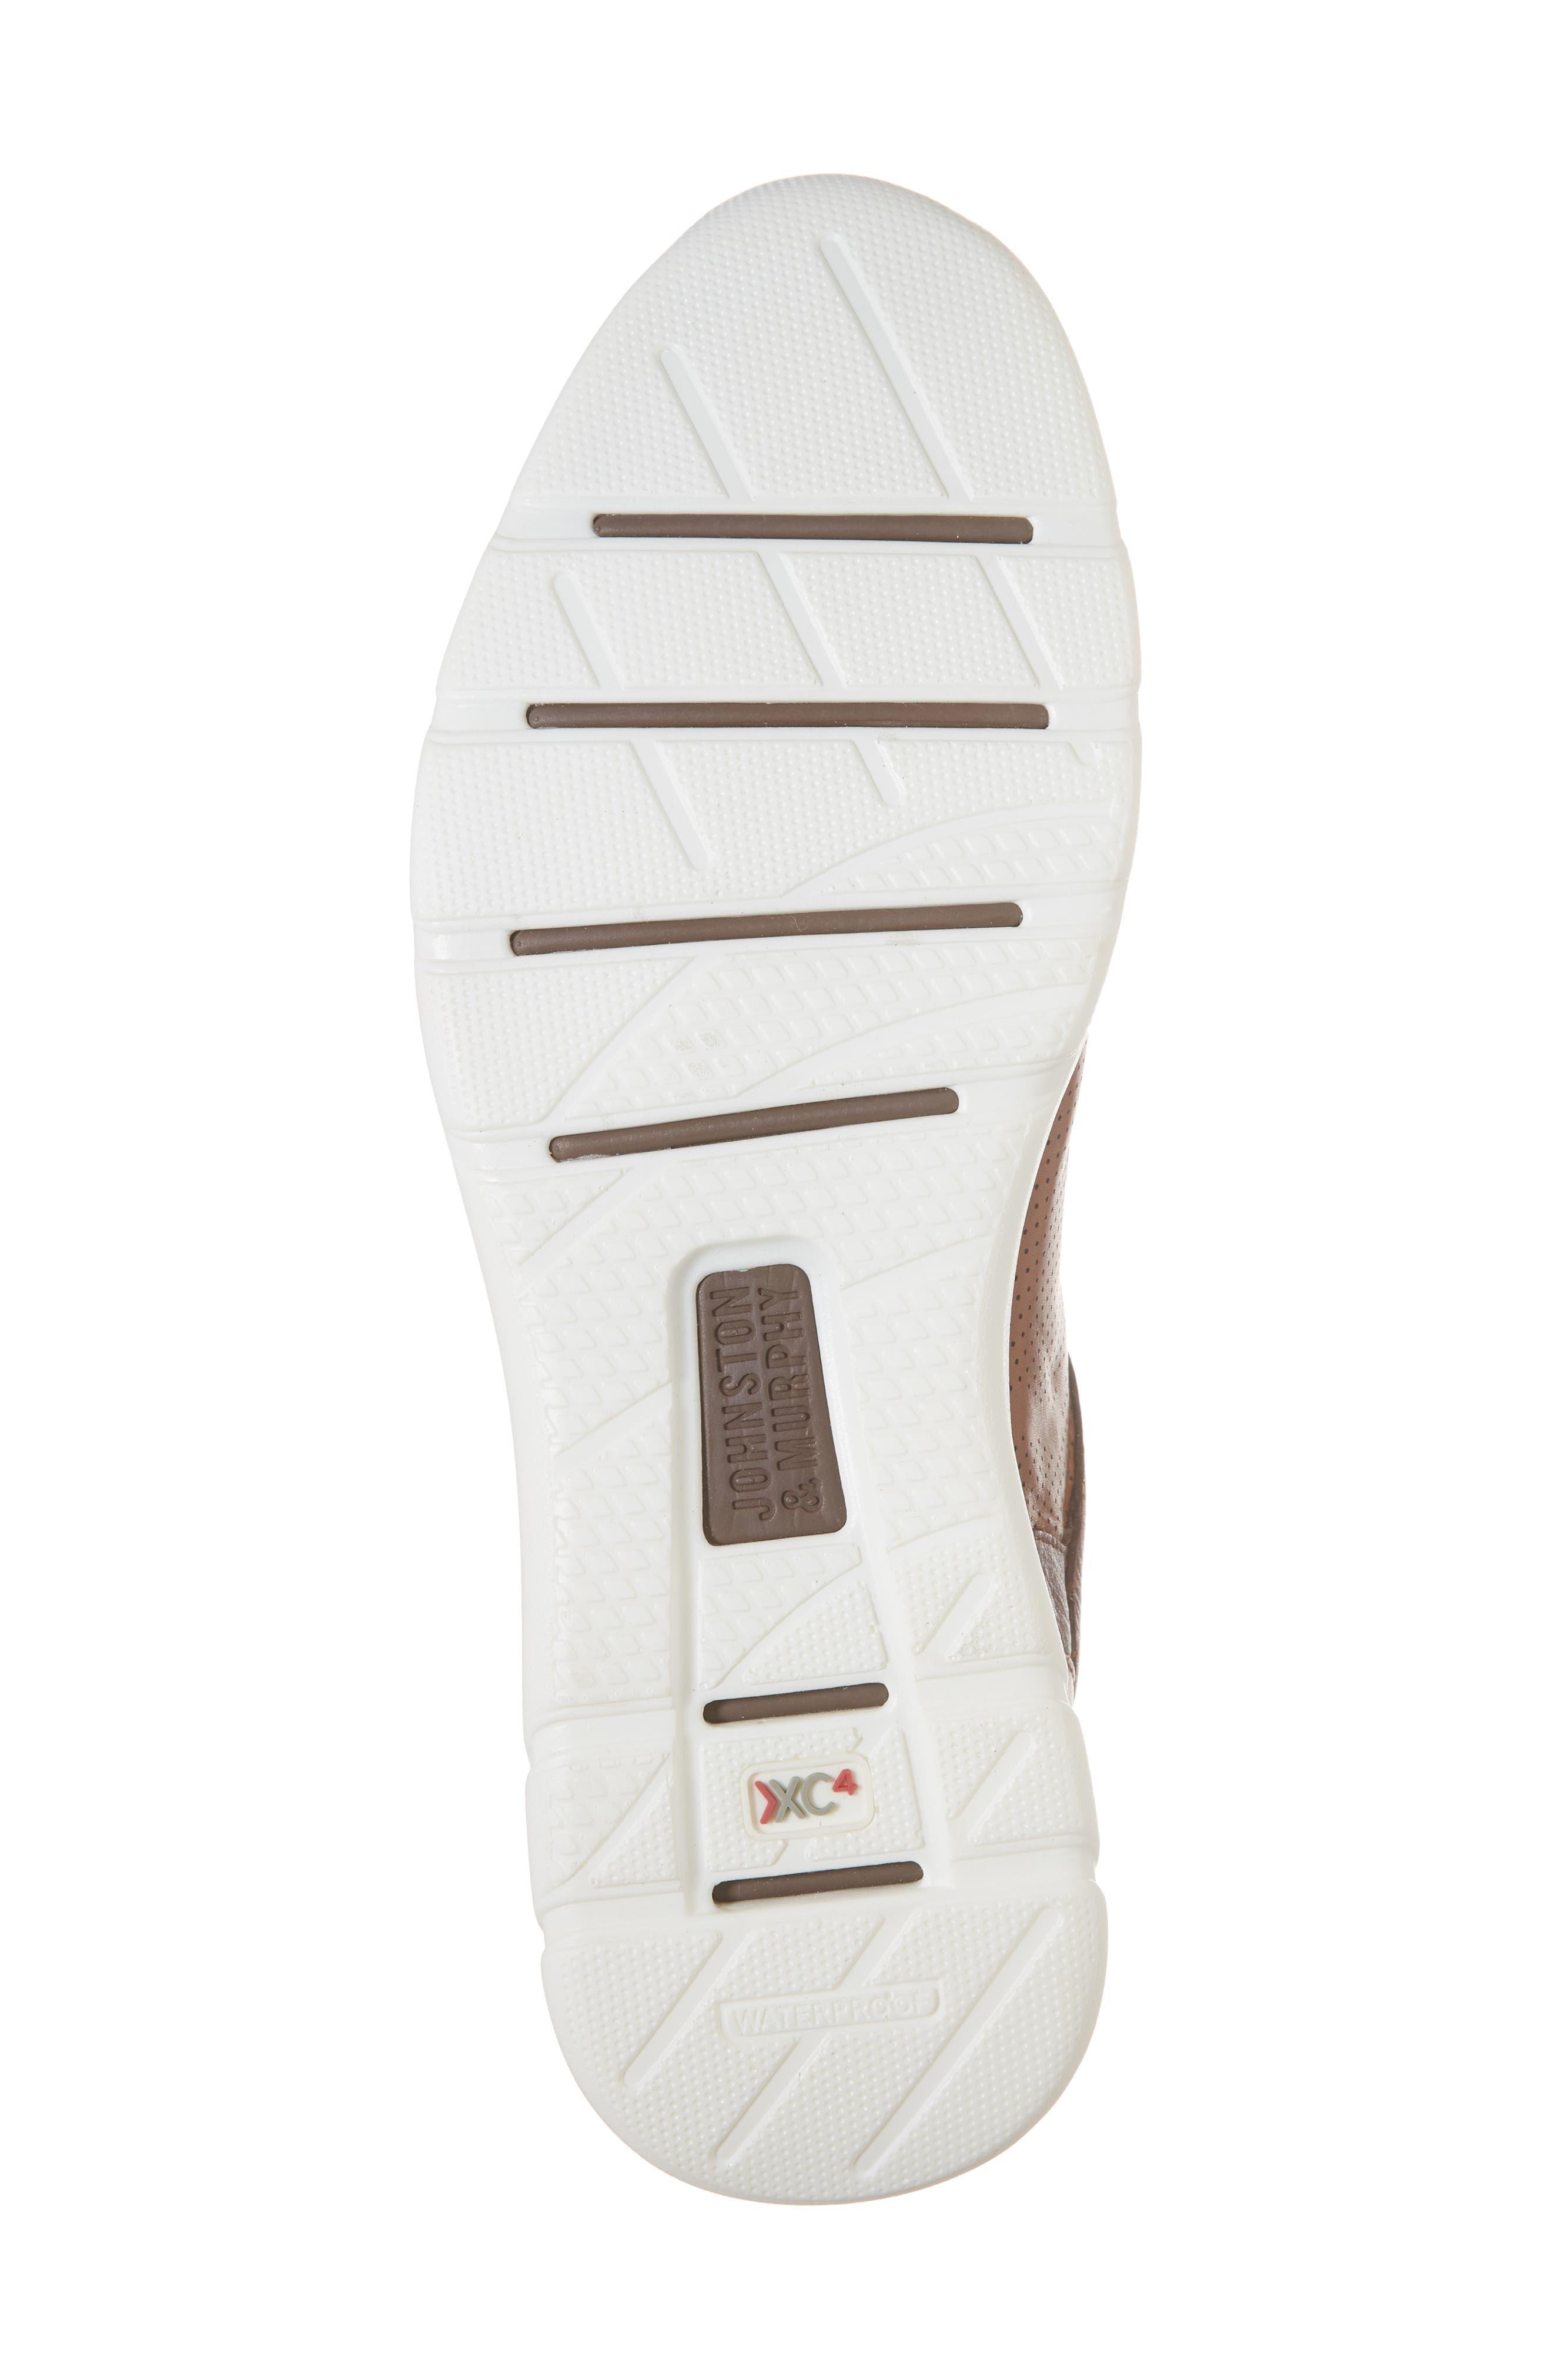 JOHNSTON & MURPHY, Prentiss XC4<sup>®</sup> Waterproof Sneaker, Alternate thumbnail 6, color, MAHOGANY LEATHER